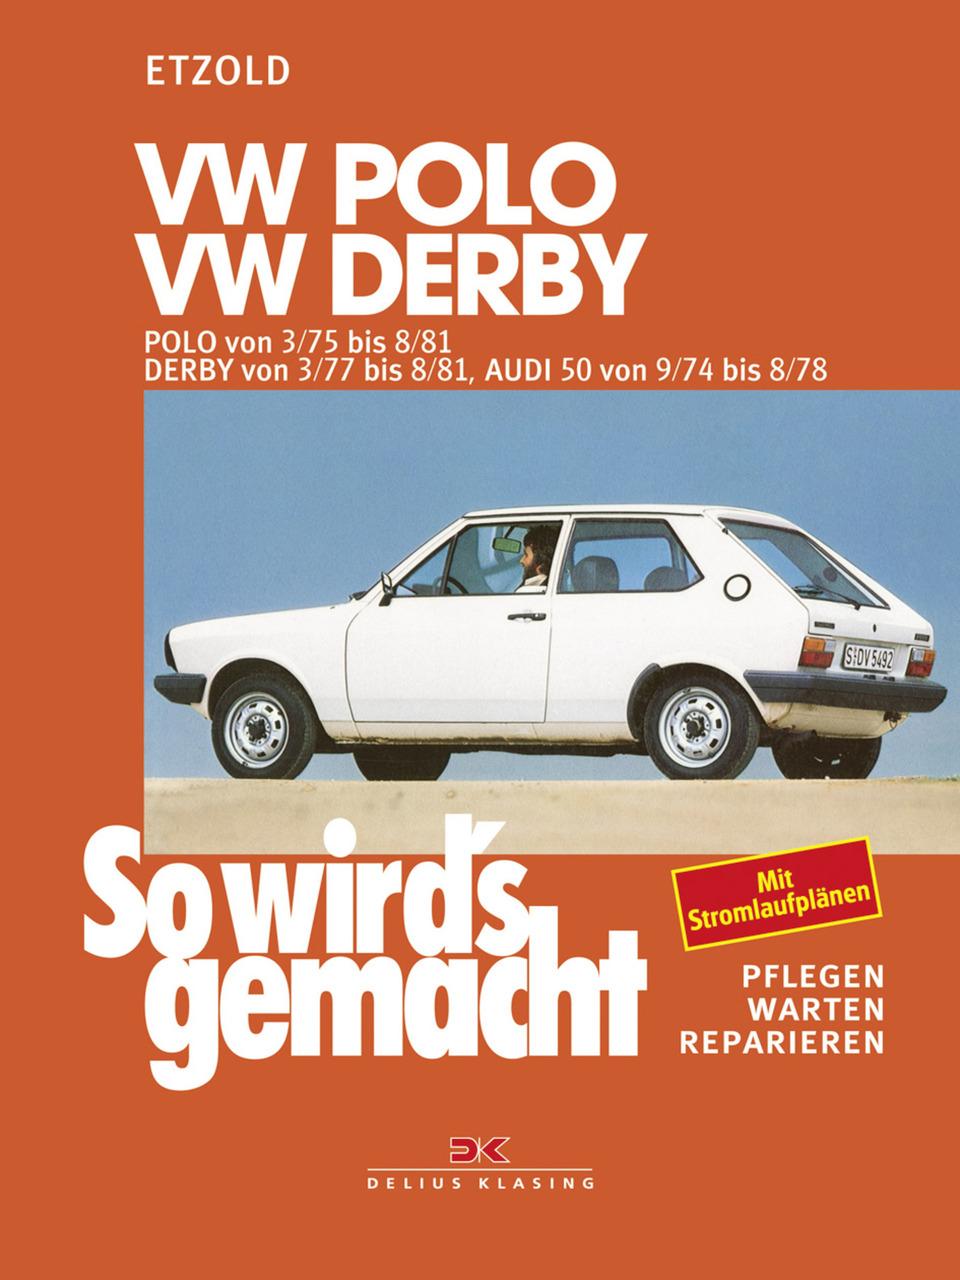 vw polo 3/75 bis 8/81, vw derby 3/77 bis 8/81, audi 50 9/74 bis 8/78